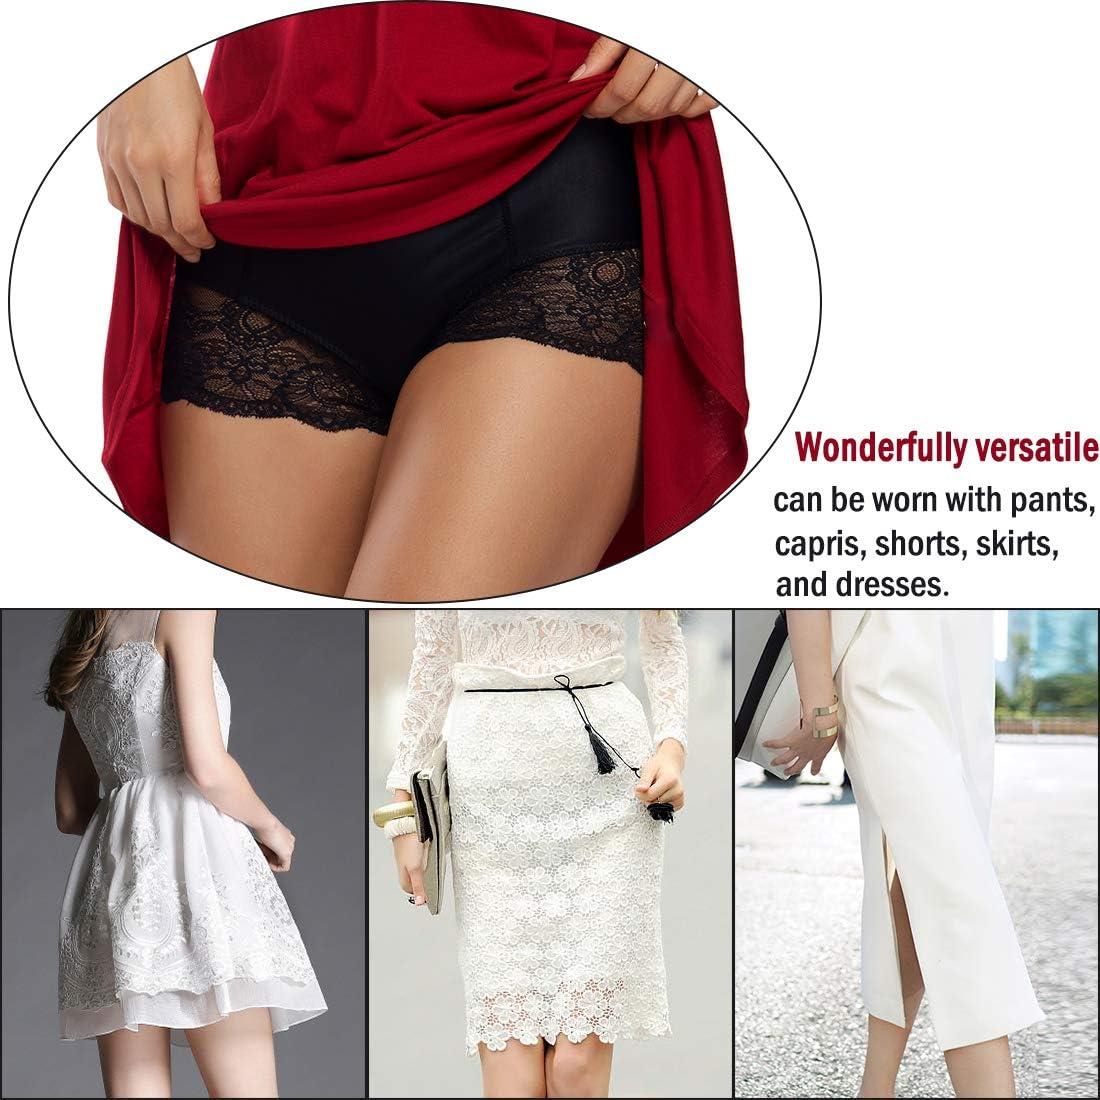 Lace Panties for Women Full Coverage Boy Shorts Under Dress Mid Waist Light Tummy Control Underwear Nylon